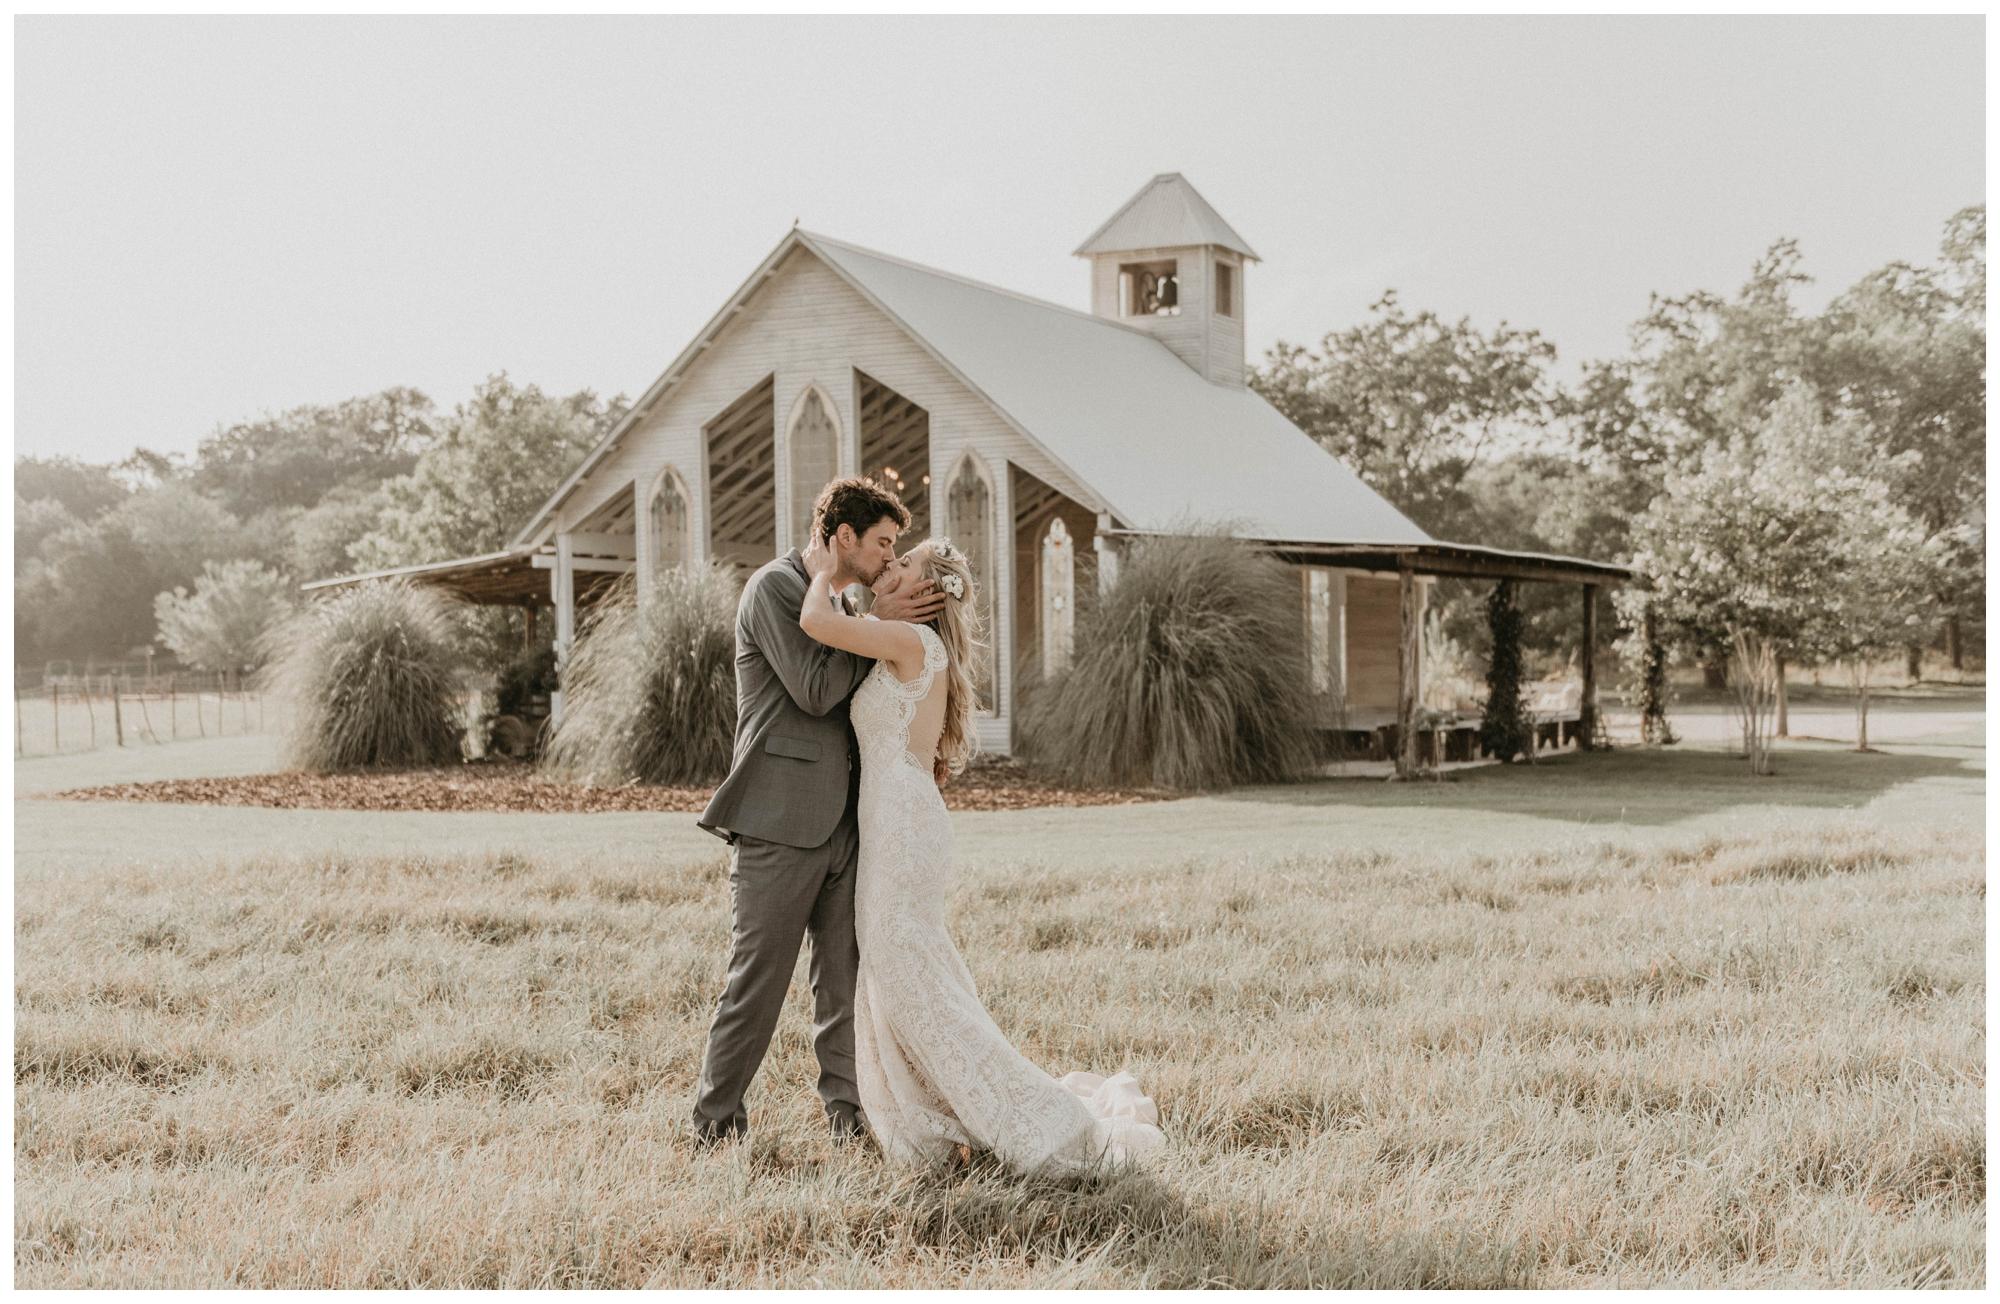 austin-texas-wedding-photography-1778-photographie_0111.jpg